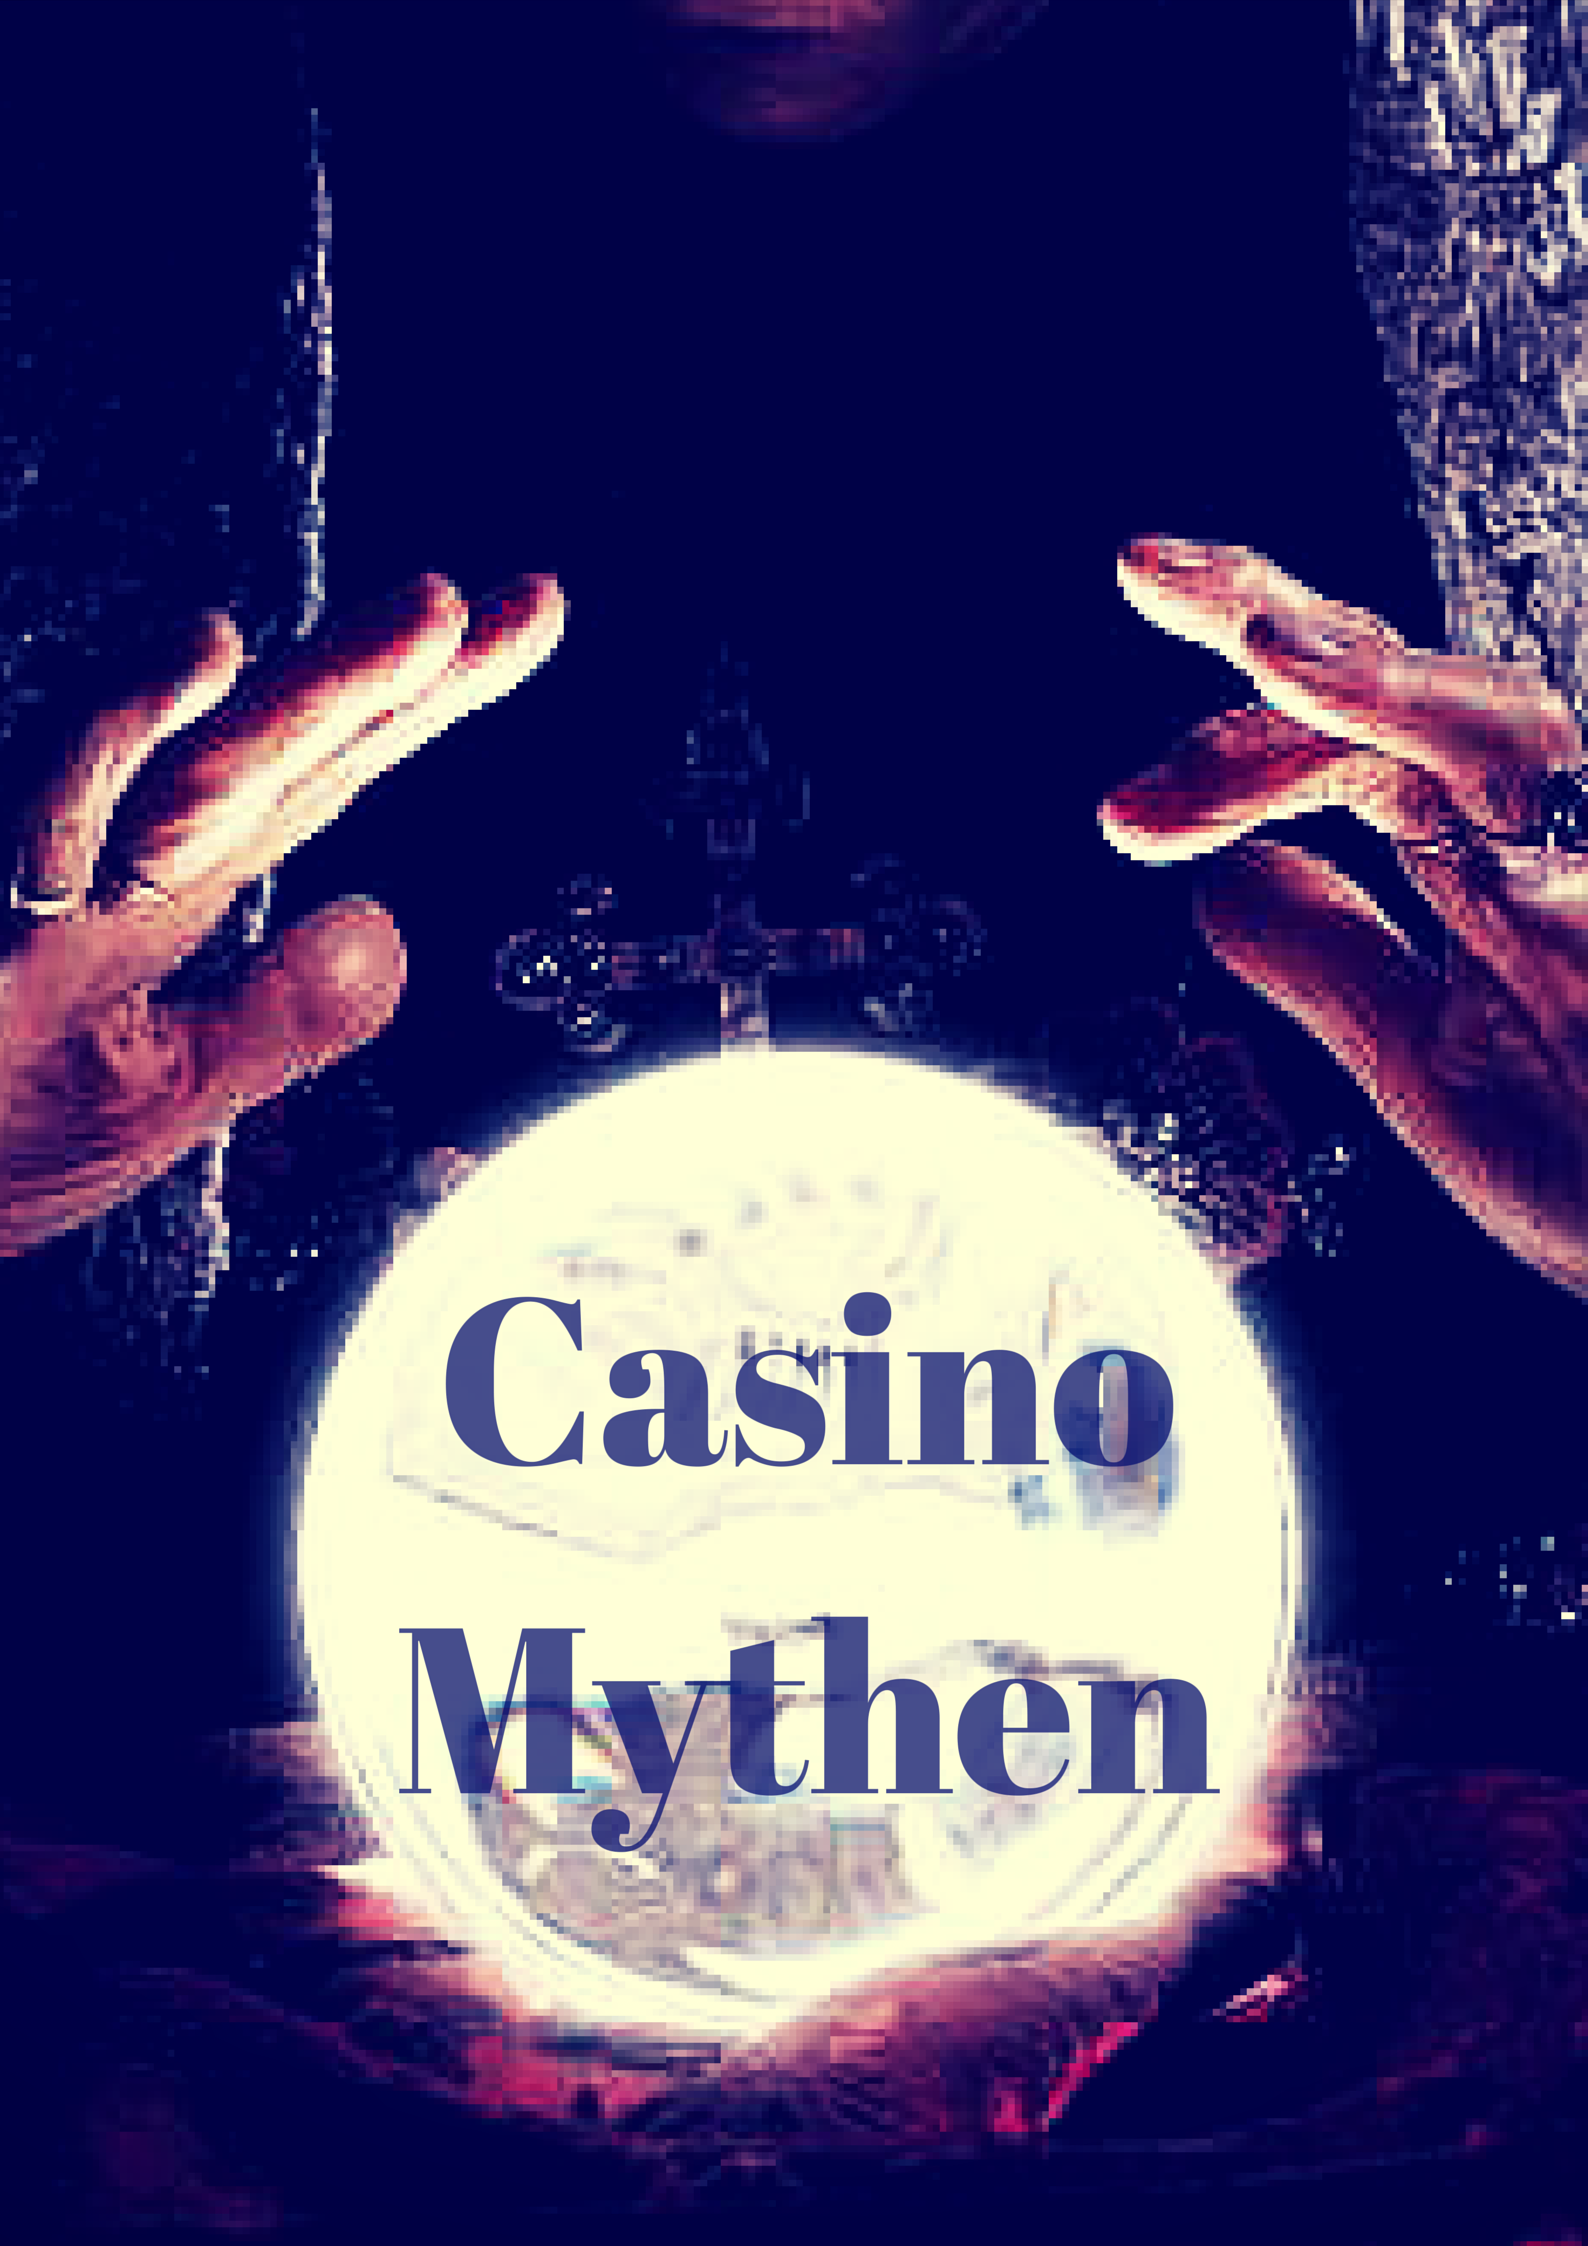 Casino Mythen